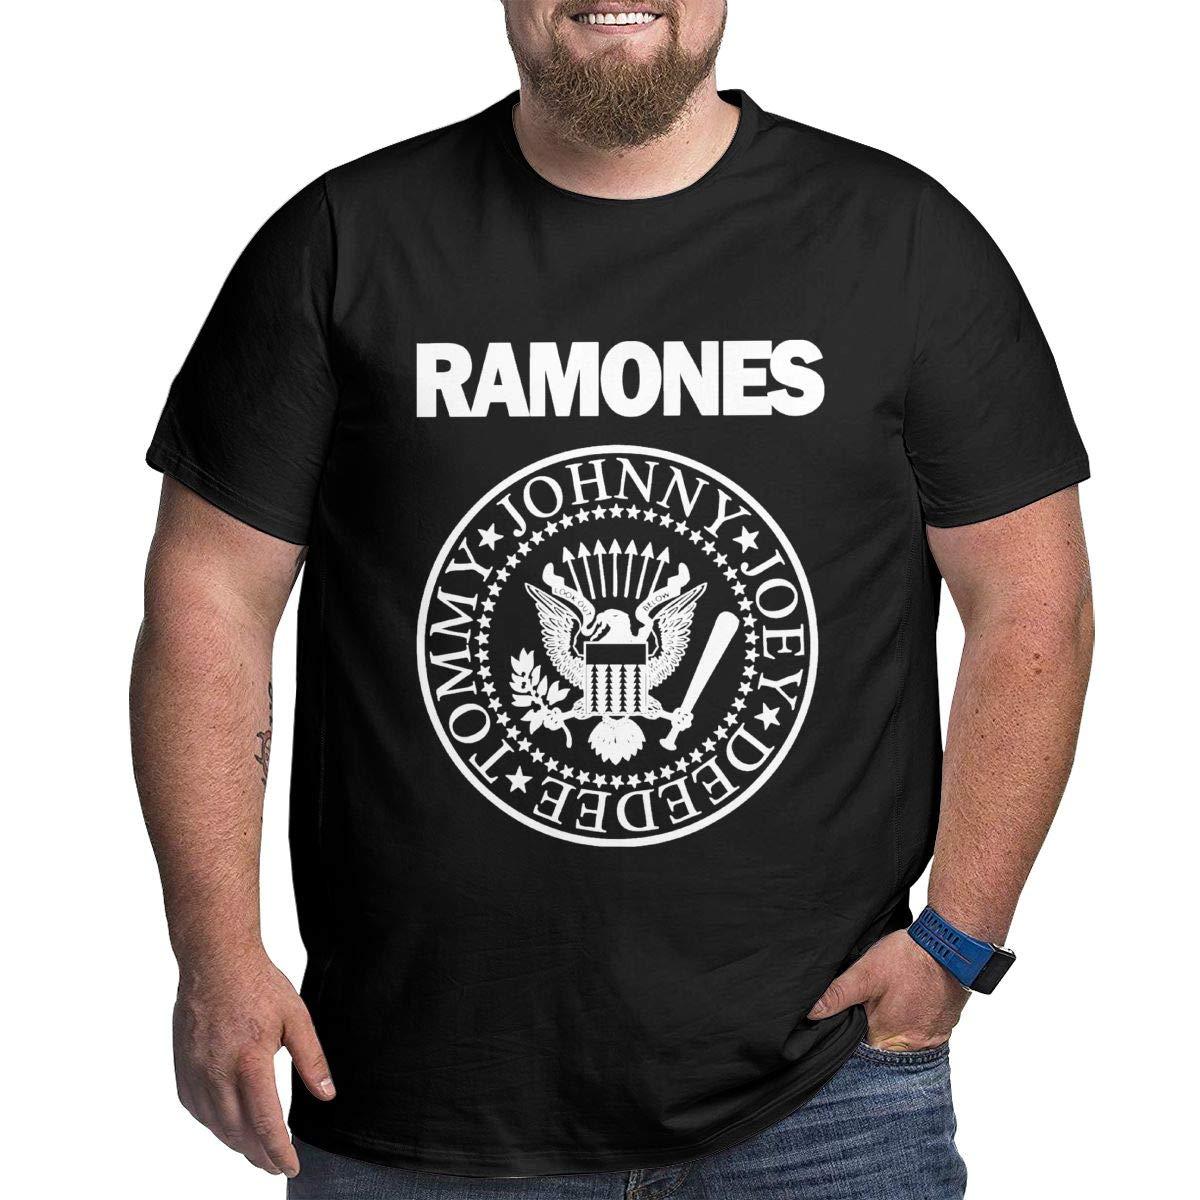 Chamtens Ramo-nes-logo T Shirt Casual Tee For